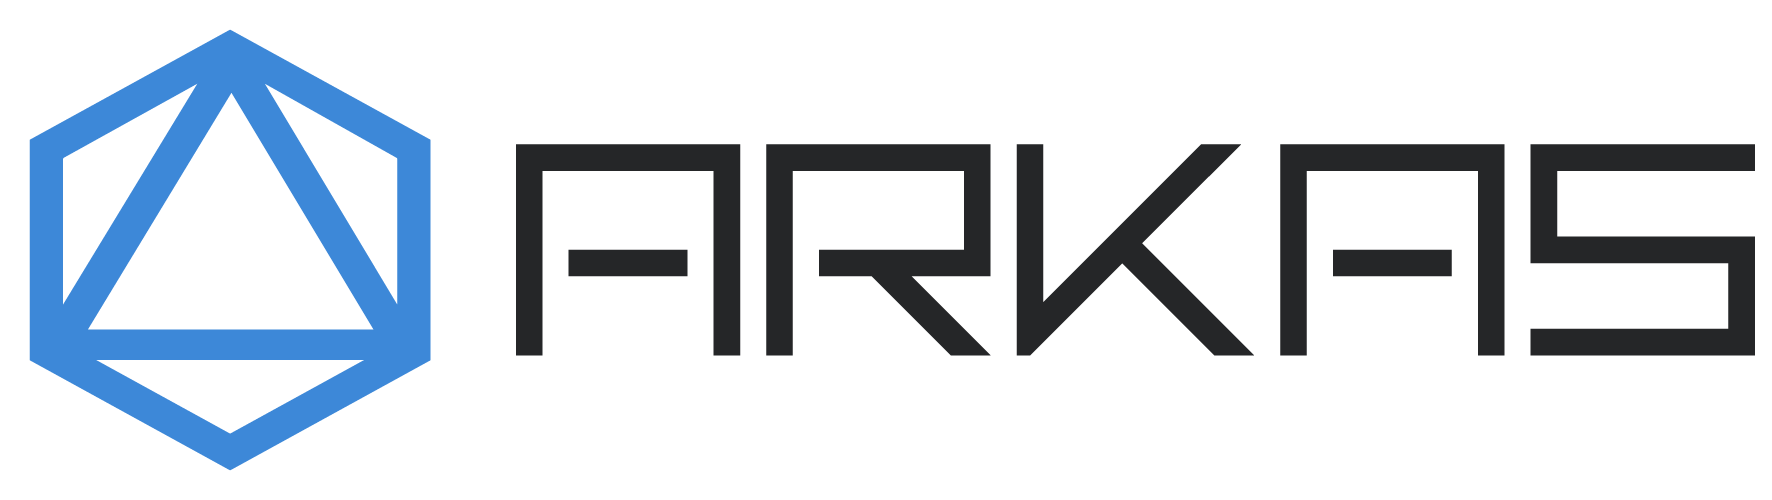 Arkas – Alchimia Tecnologica